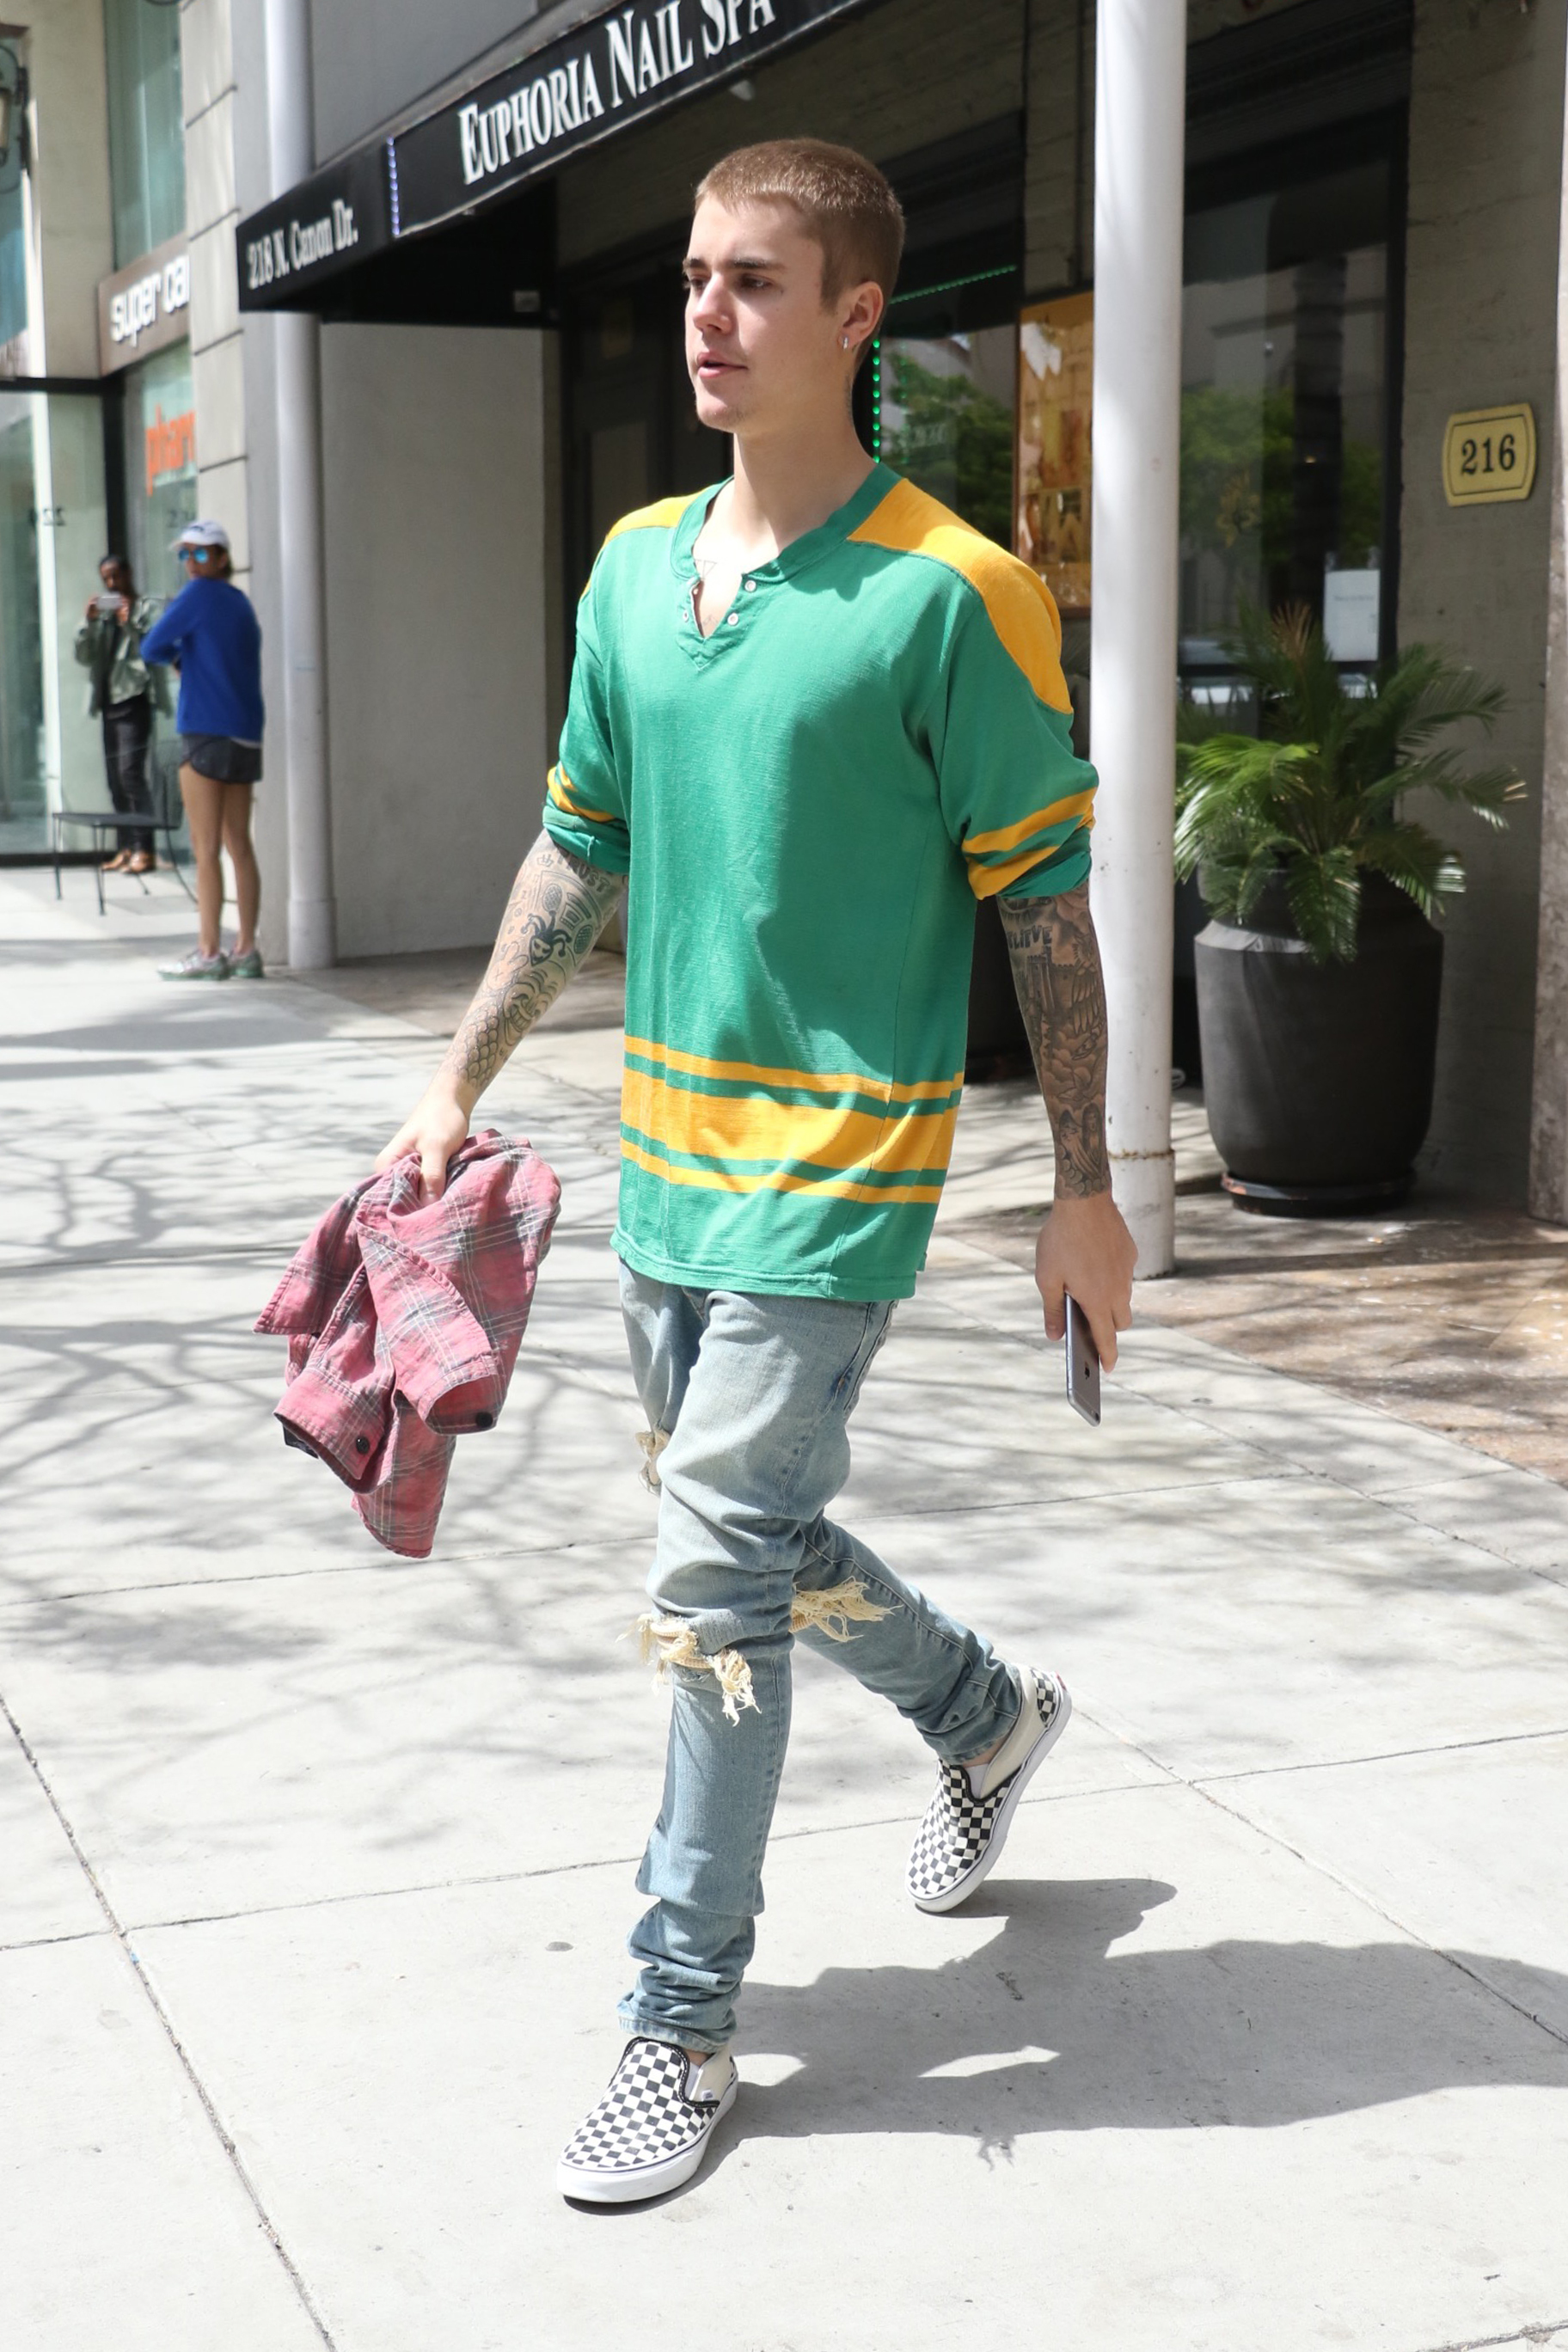 Justin Bieber wants ex neighbors to undergo mental health evals